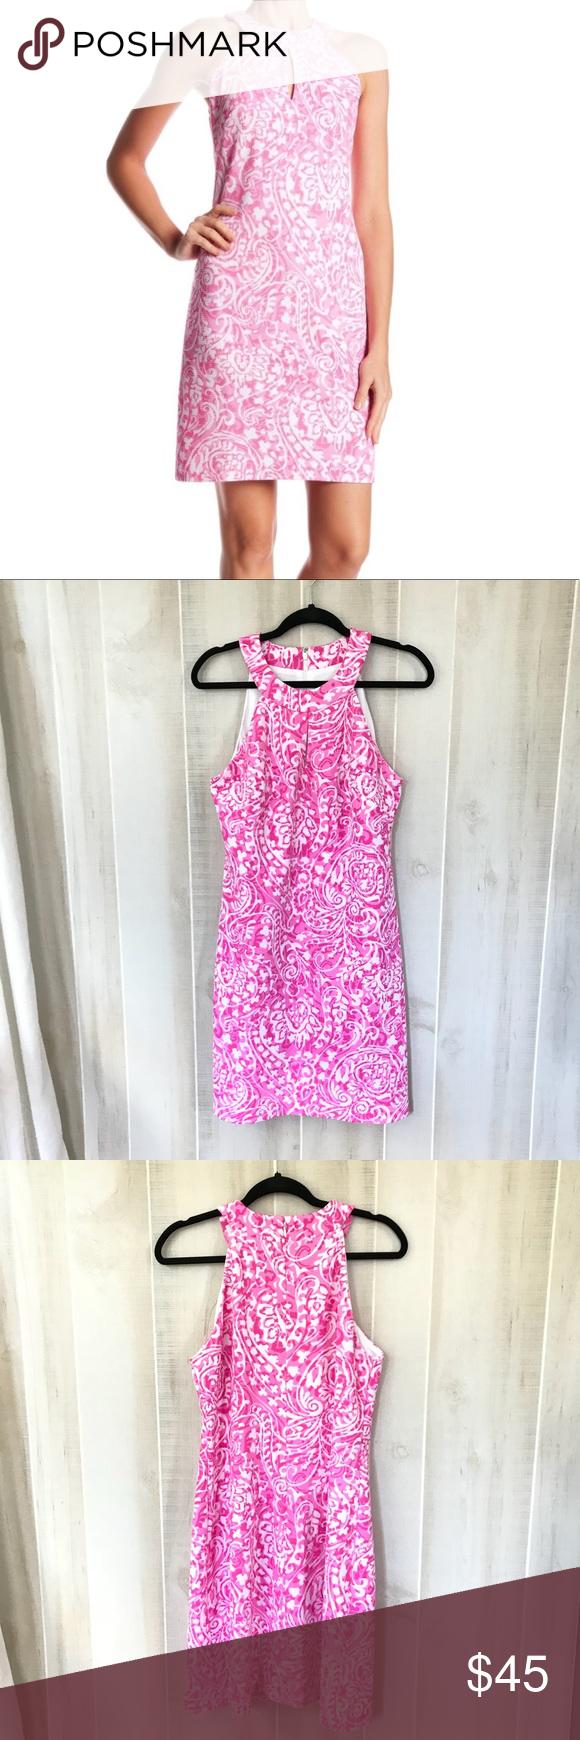 Vince Camuto Pink White Shift Dress White Shift Dresses Shift Dress Dresses [ 1740 x 580 Pixel ]